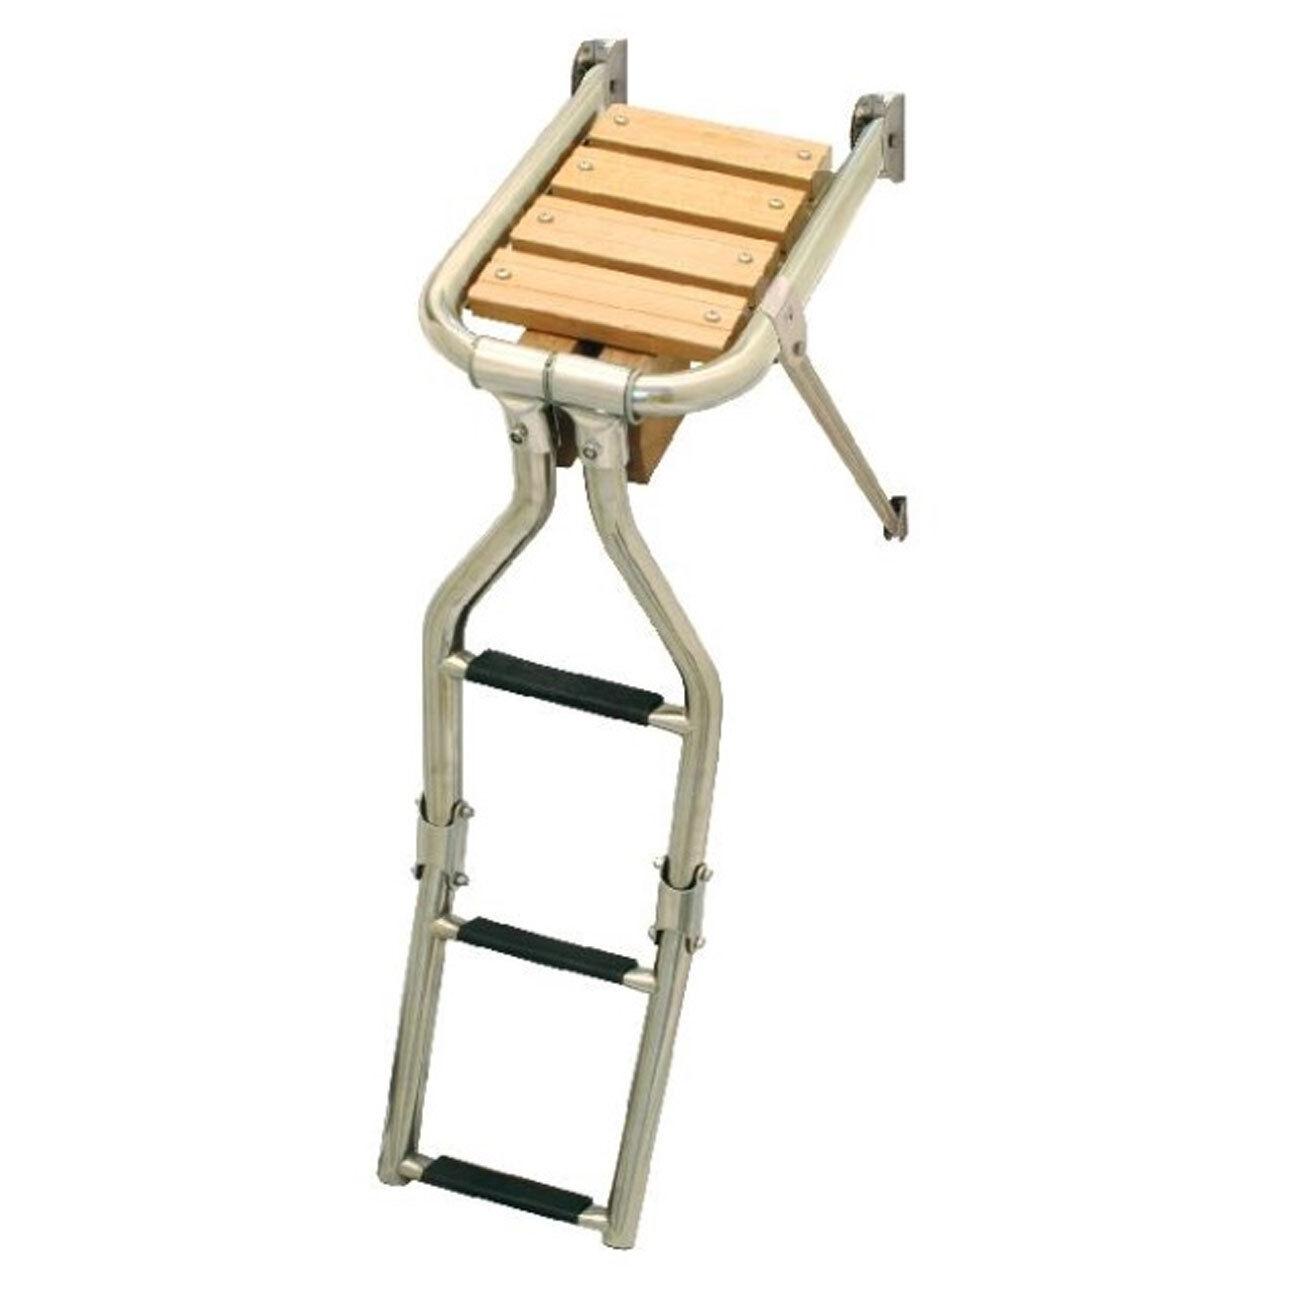 Lalizas   Nuova Rade Teak Wood Bathing Platform with Ladder Folding